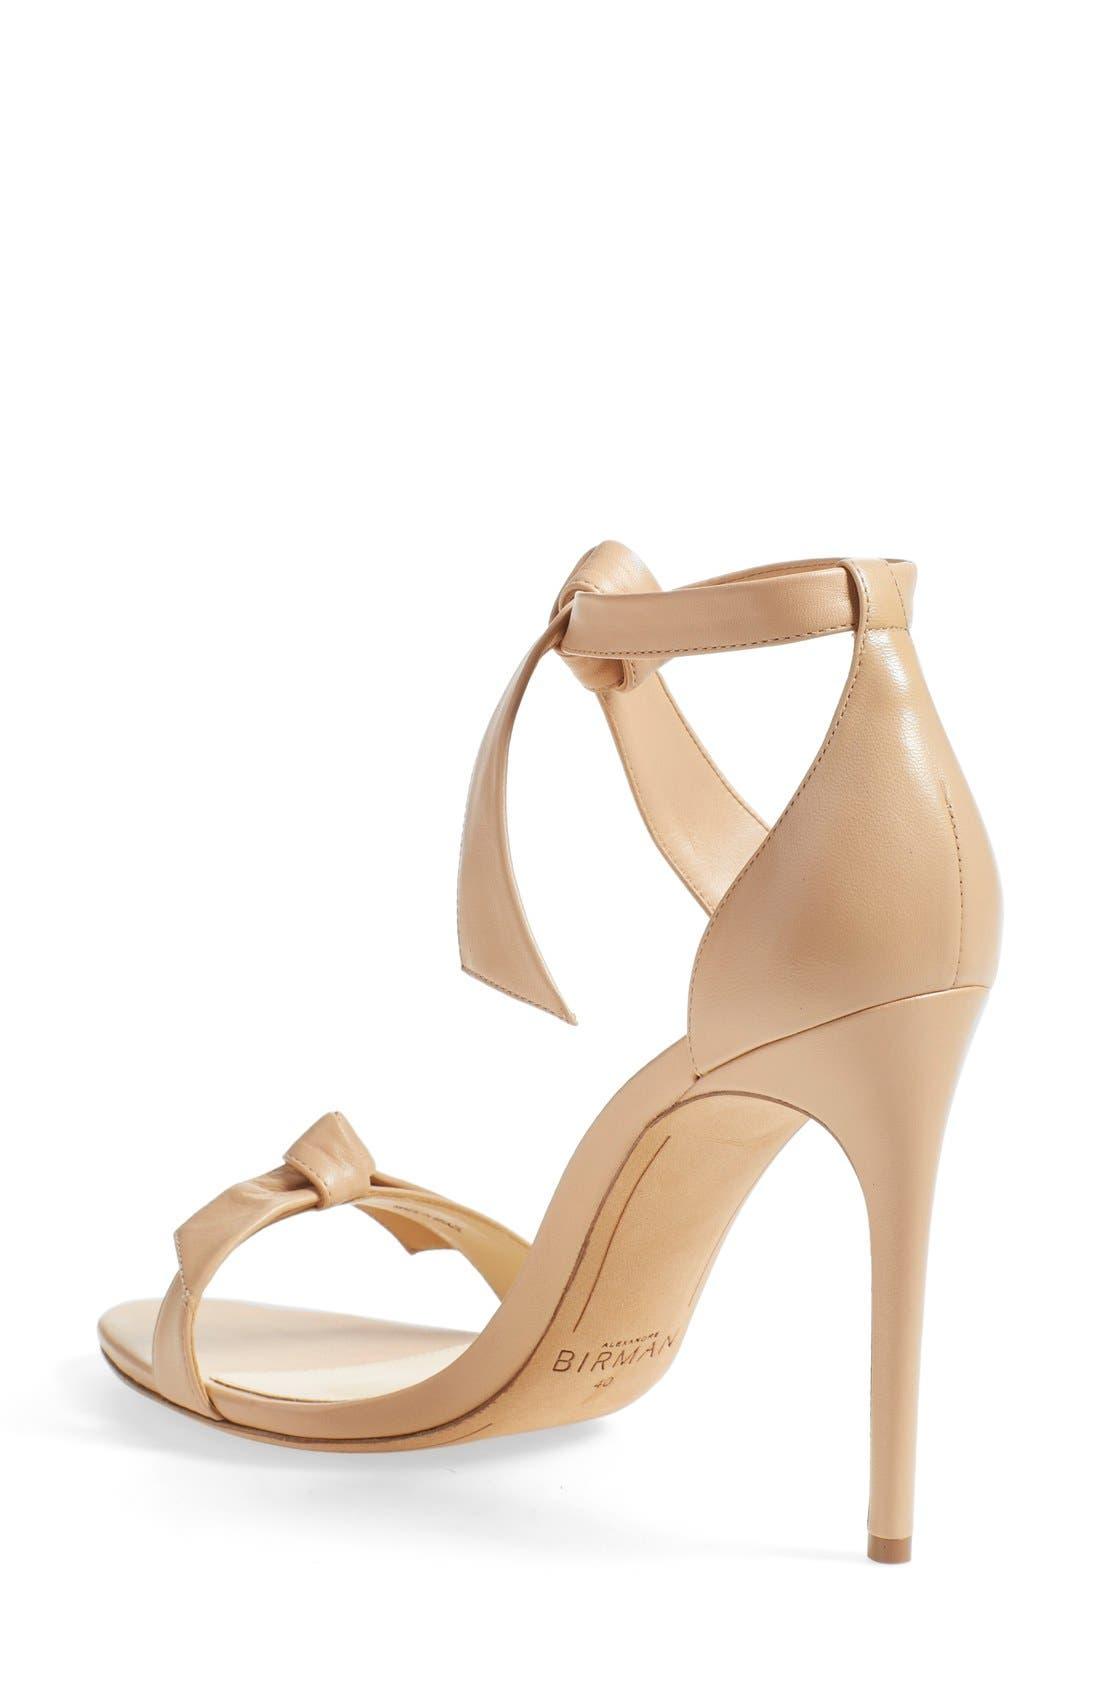 'Clarita' Ankle Tie Sandal,                             Alternate thumbnail 2, color,                             Nude Soft Leather